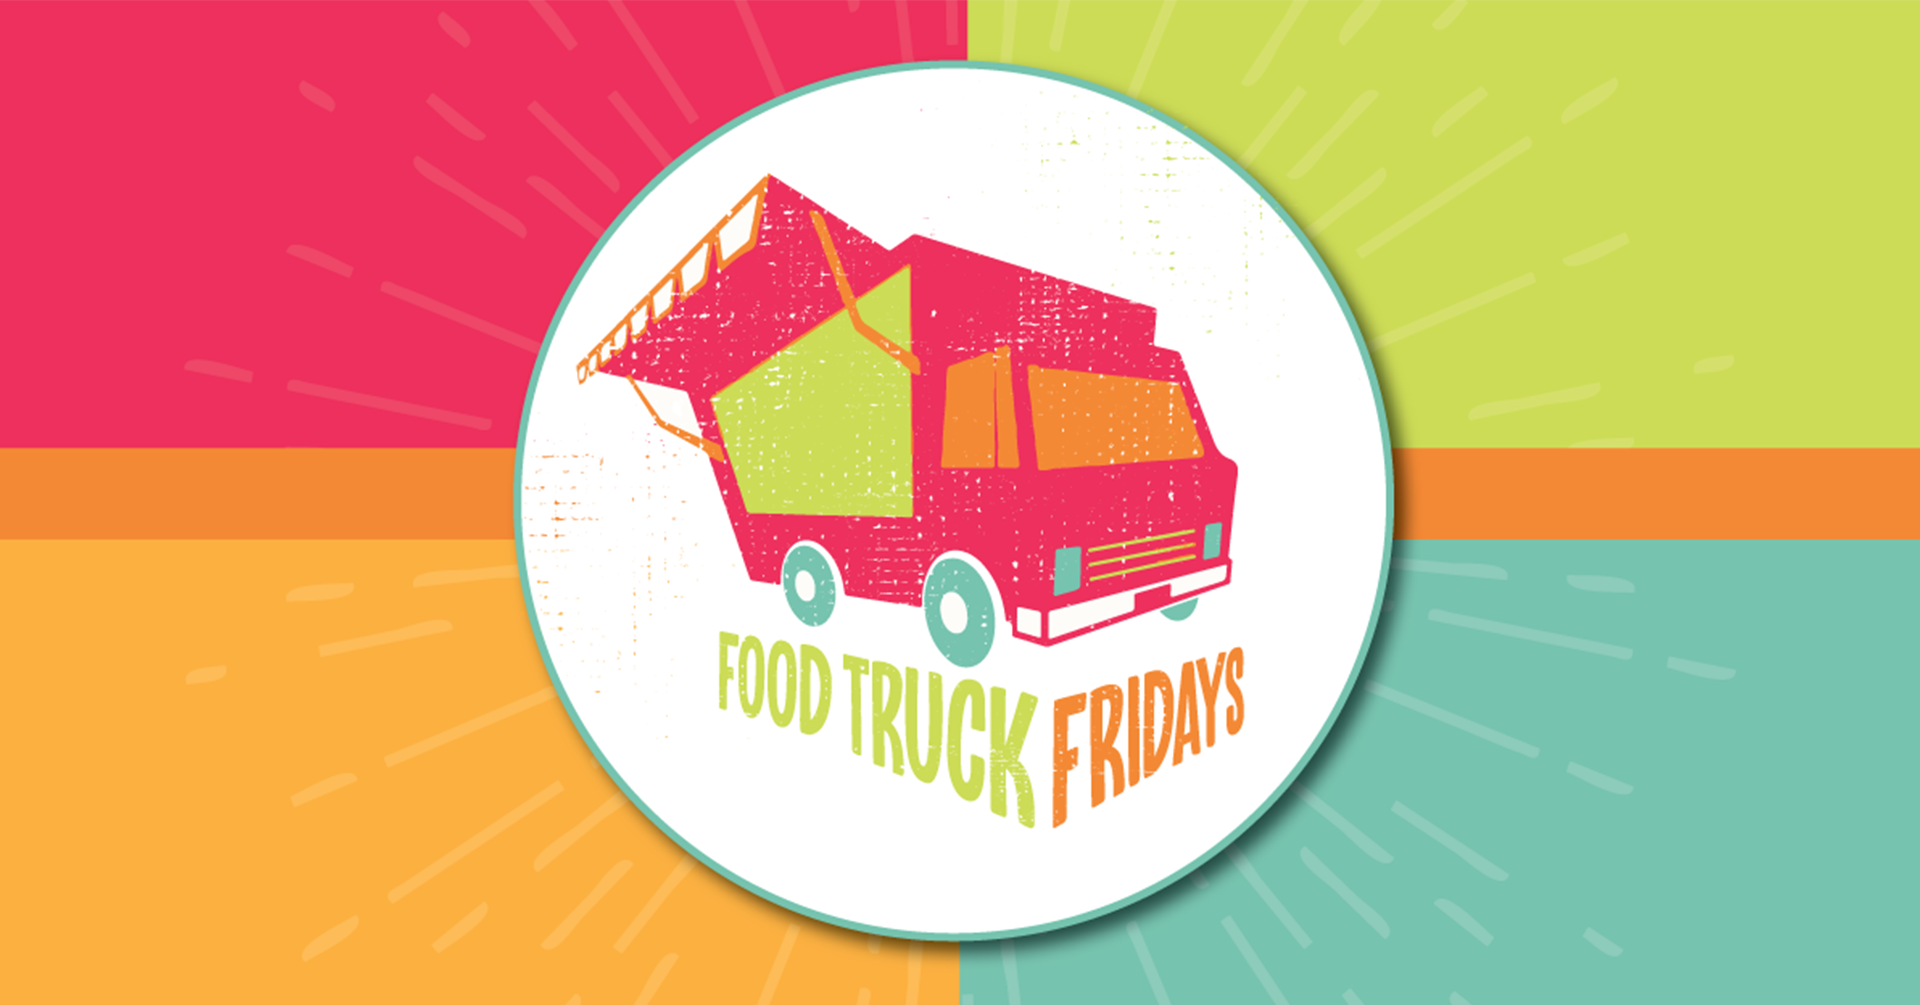 Sioux City Food Truck Fridays